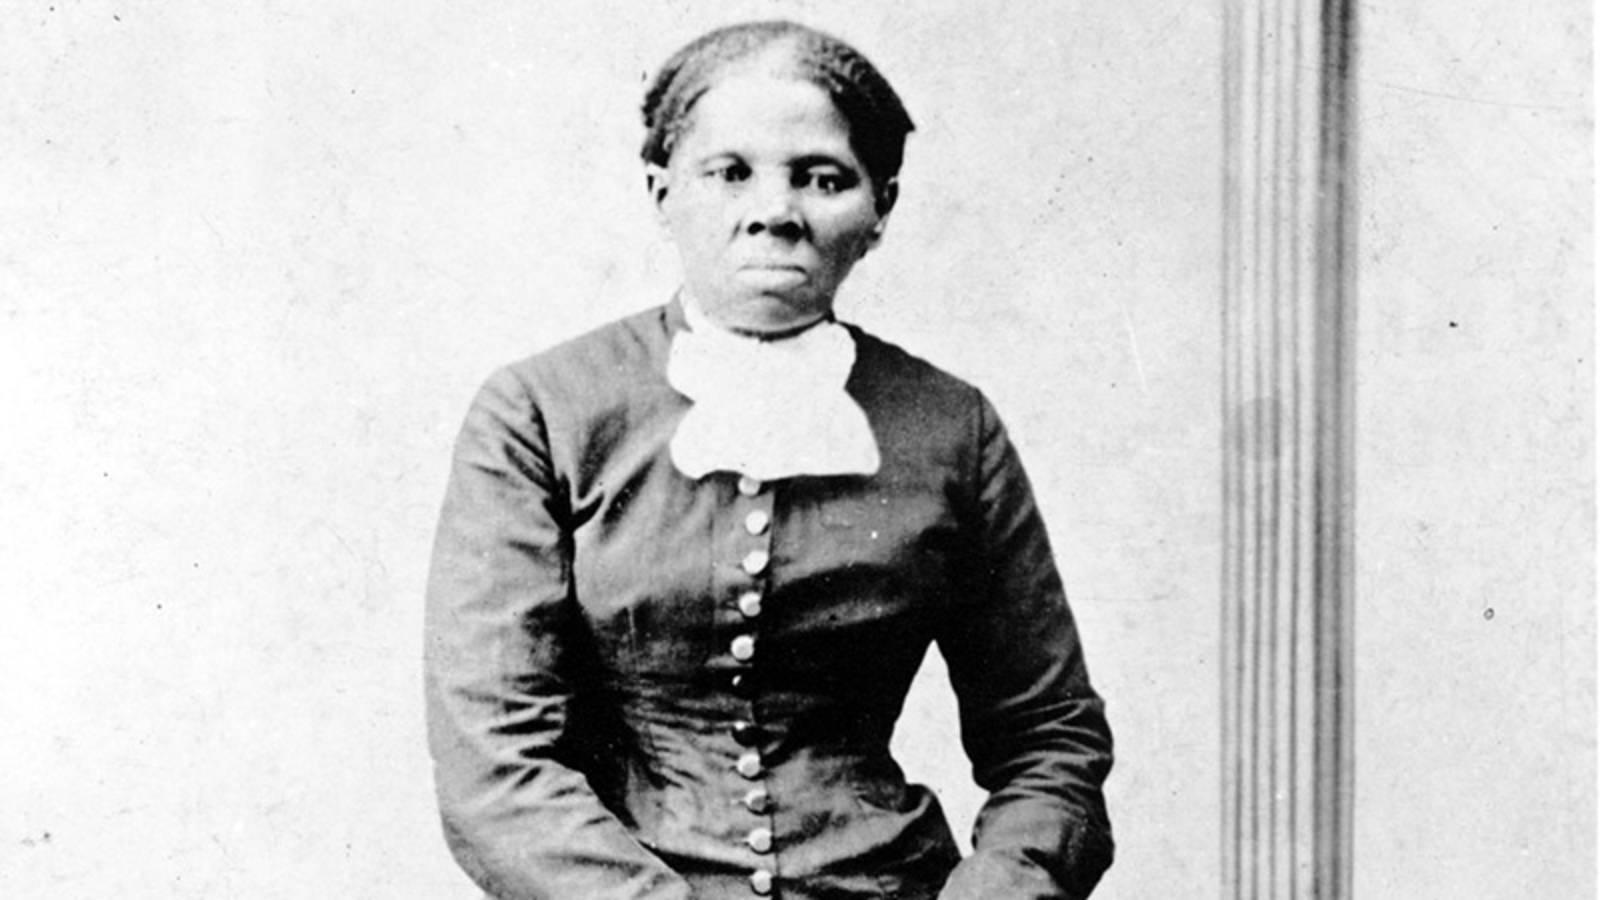 ¿Quién fue Harriet Tubman?